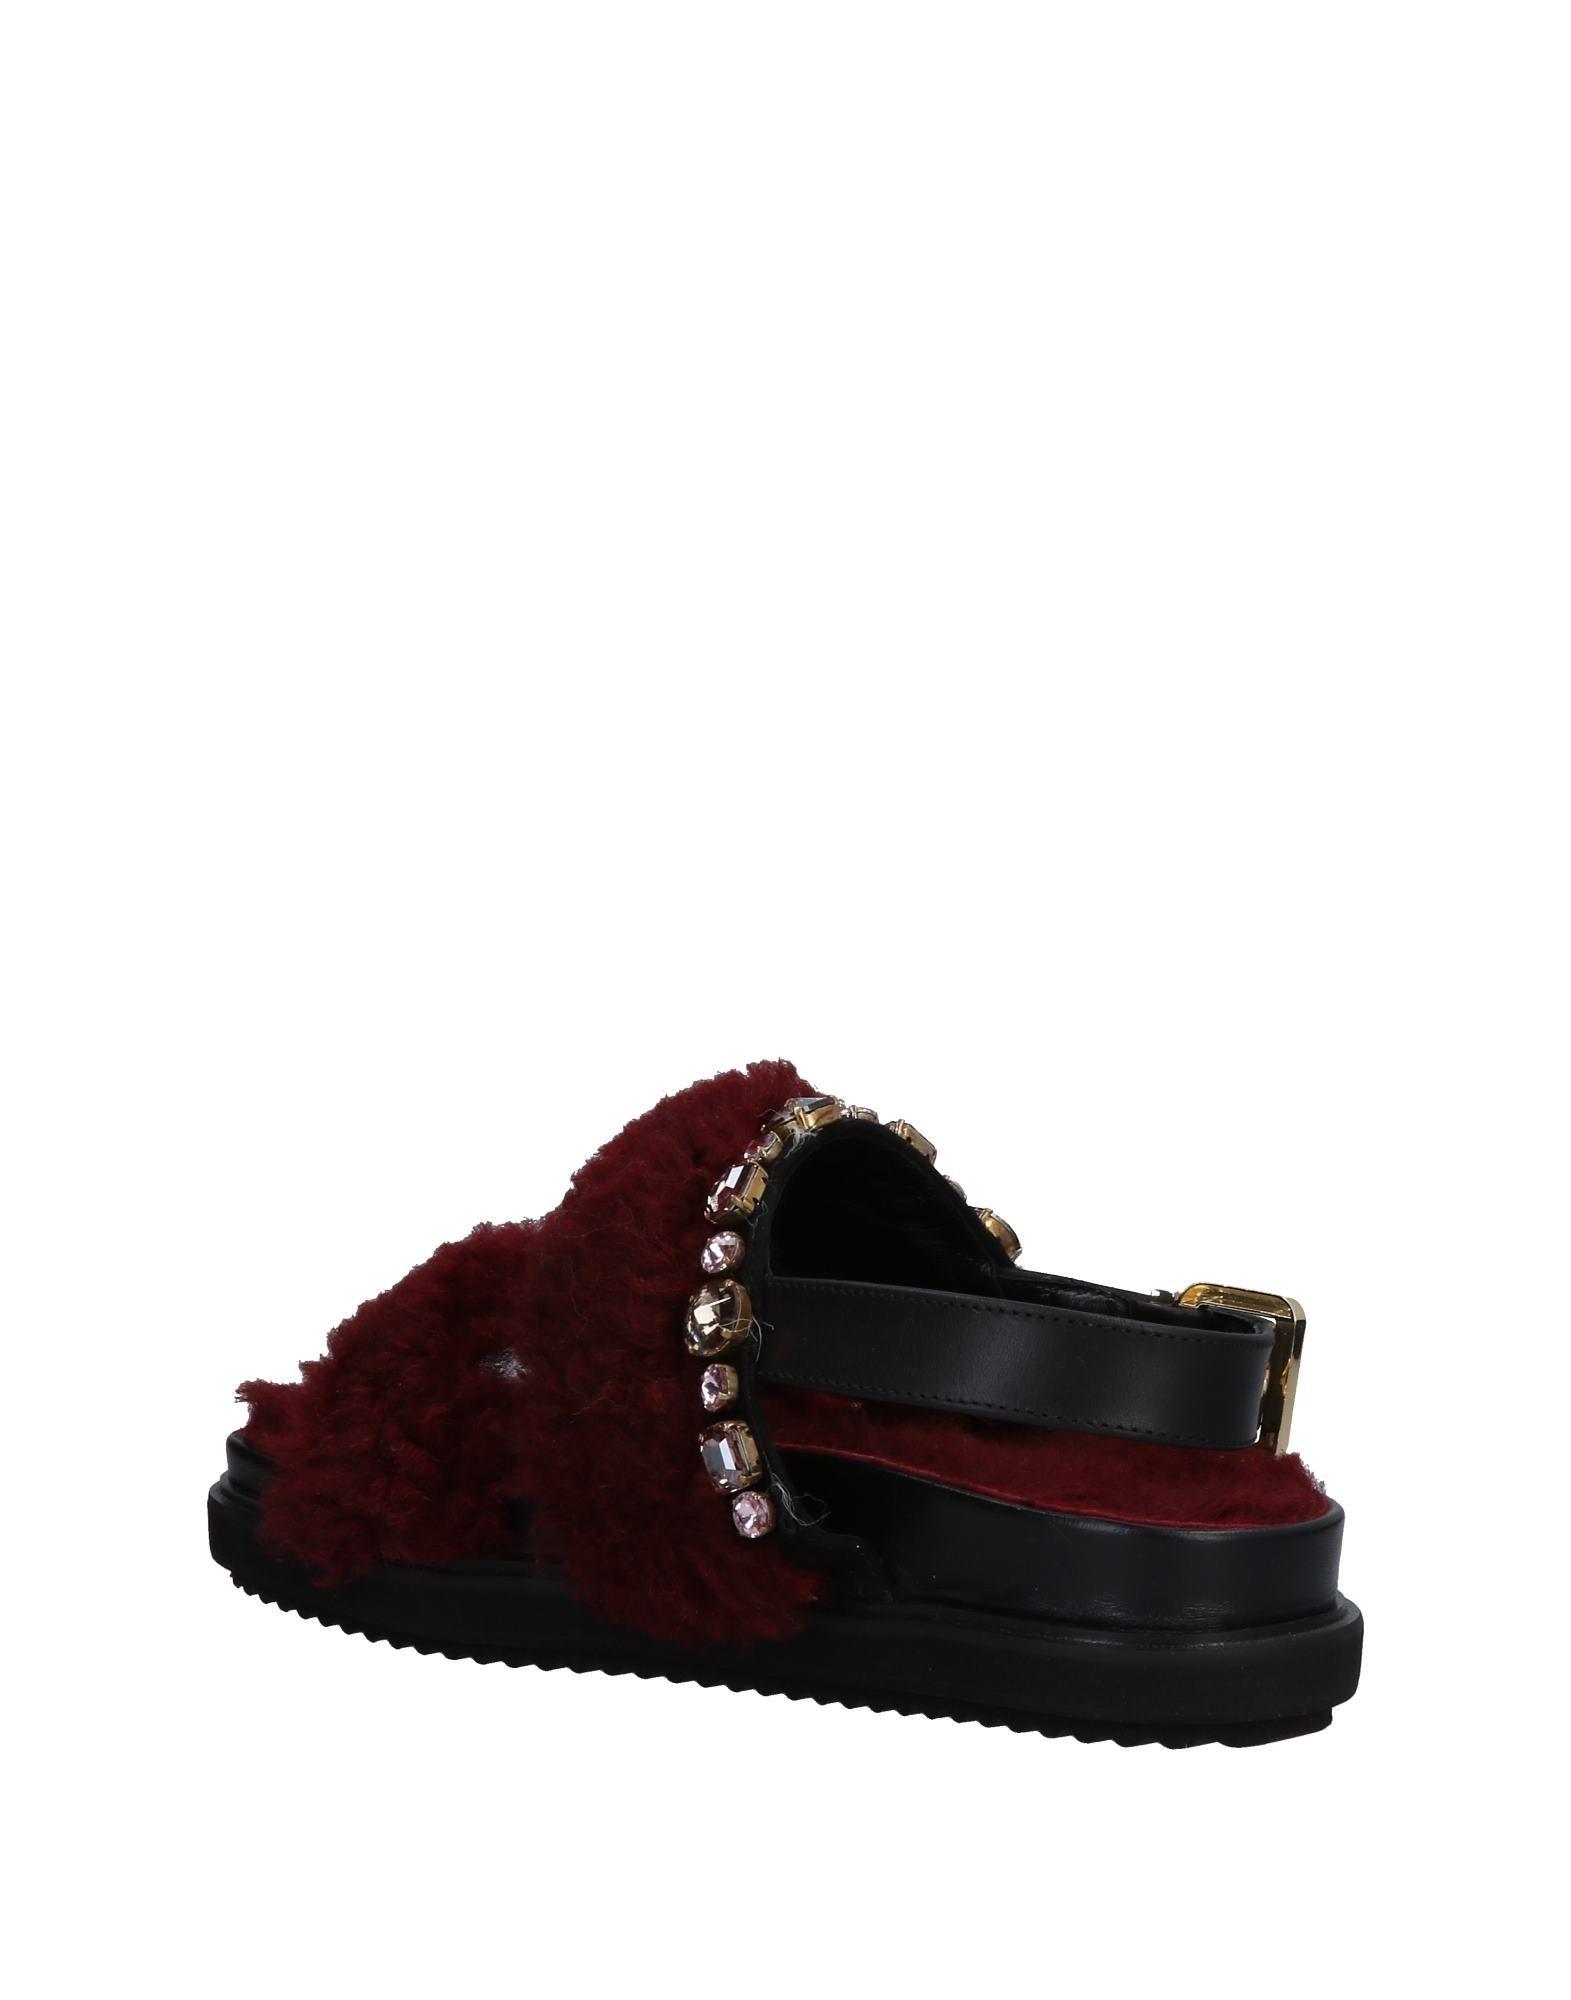 Stilvolle Capri billige Schuhe Emanuela Caruso Capri Stilvolle Sandalen Damen  11469983RA 5b0b75